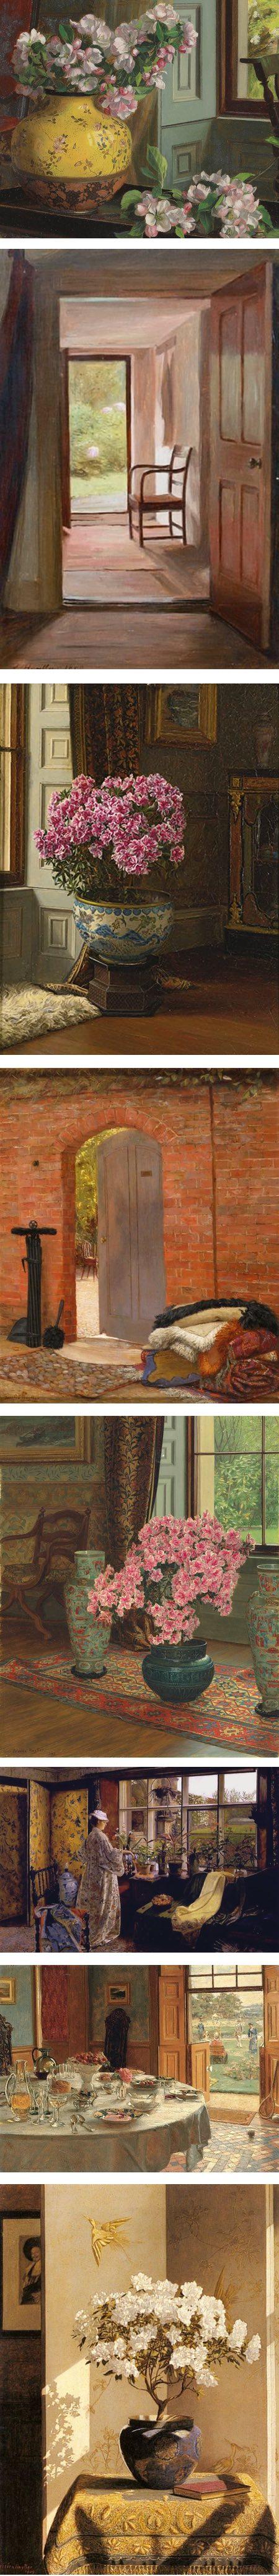 Jessica Hayllar interiors and still life